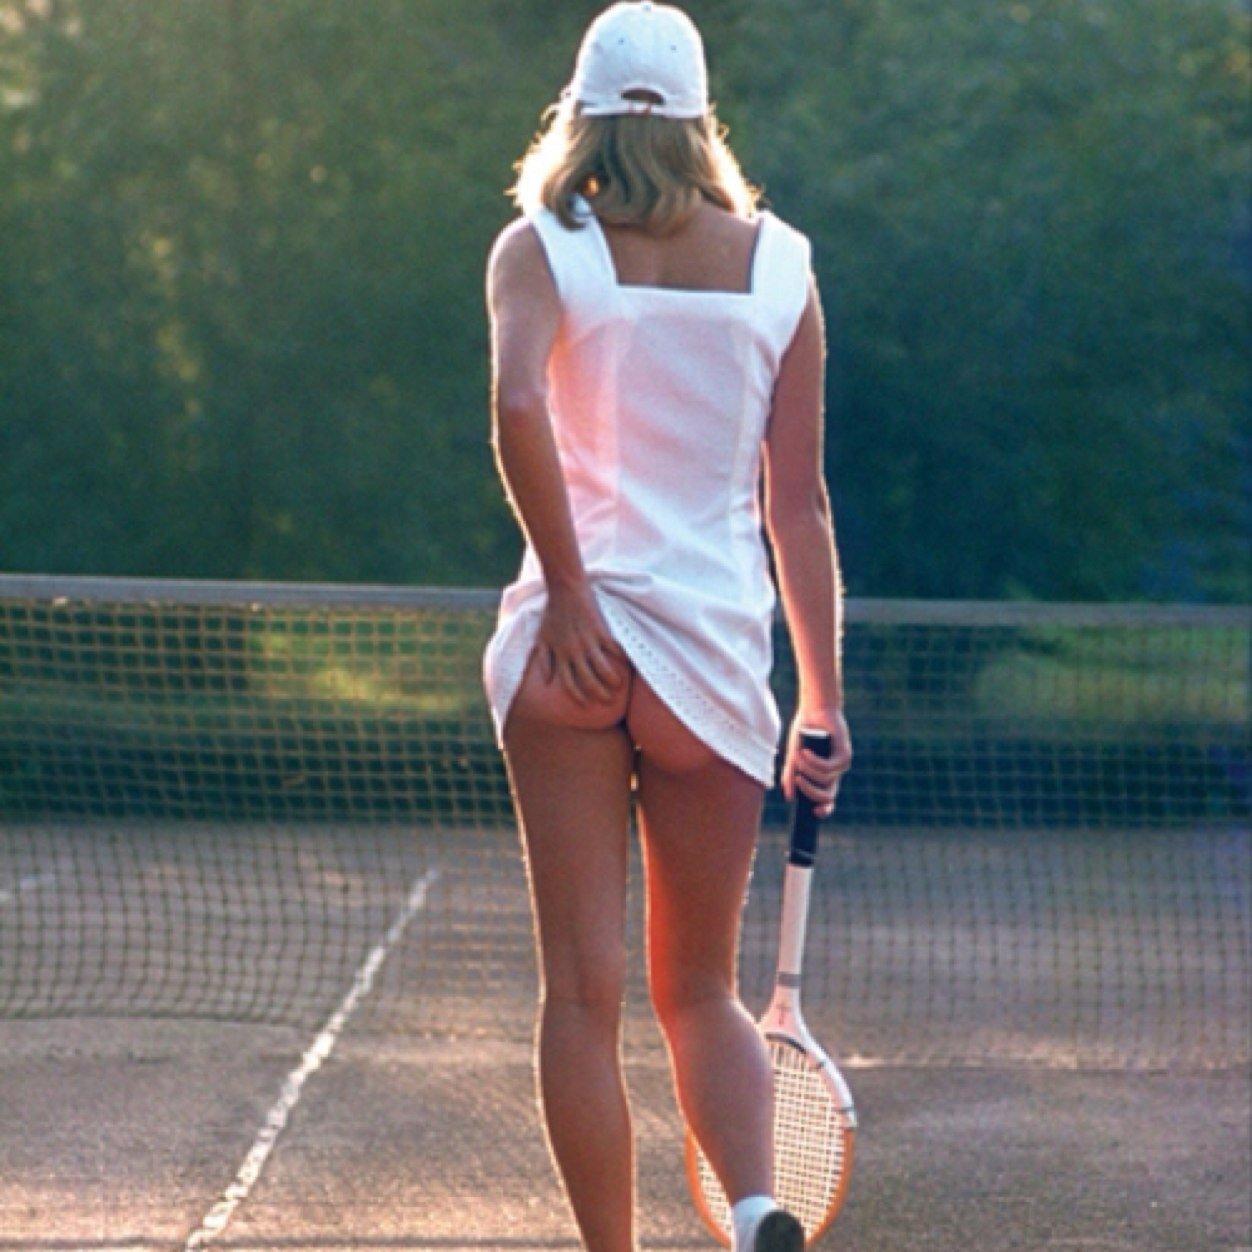 hot blonde naked in tennis wear